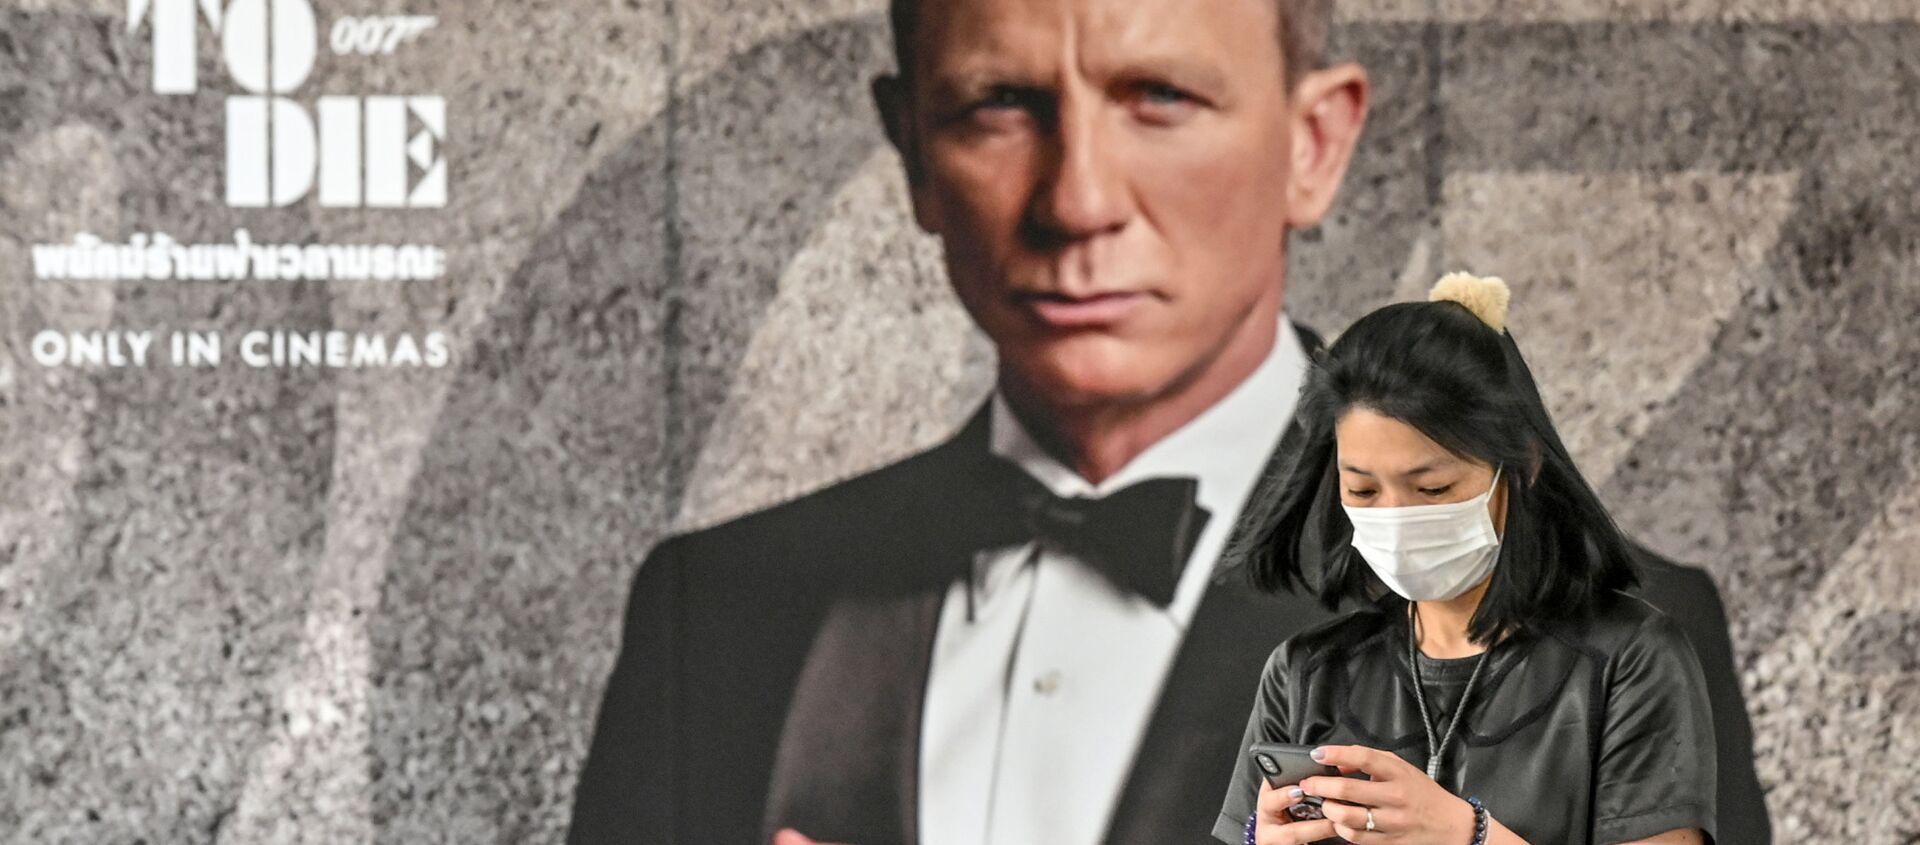 No Time To Die, la nueva película de James Bond - Sputnik Mundo, 1920, 22.01.2021